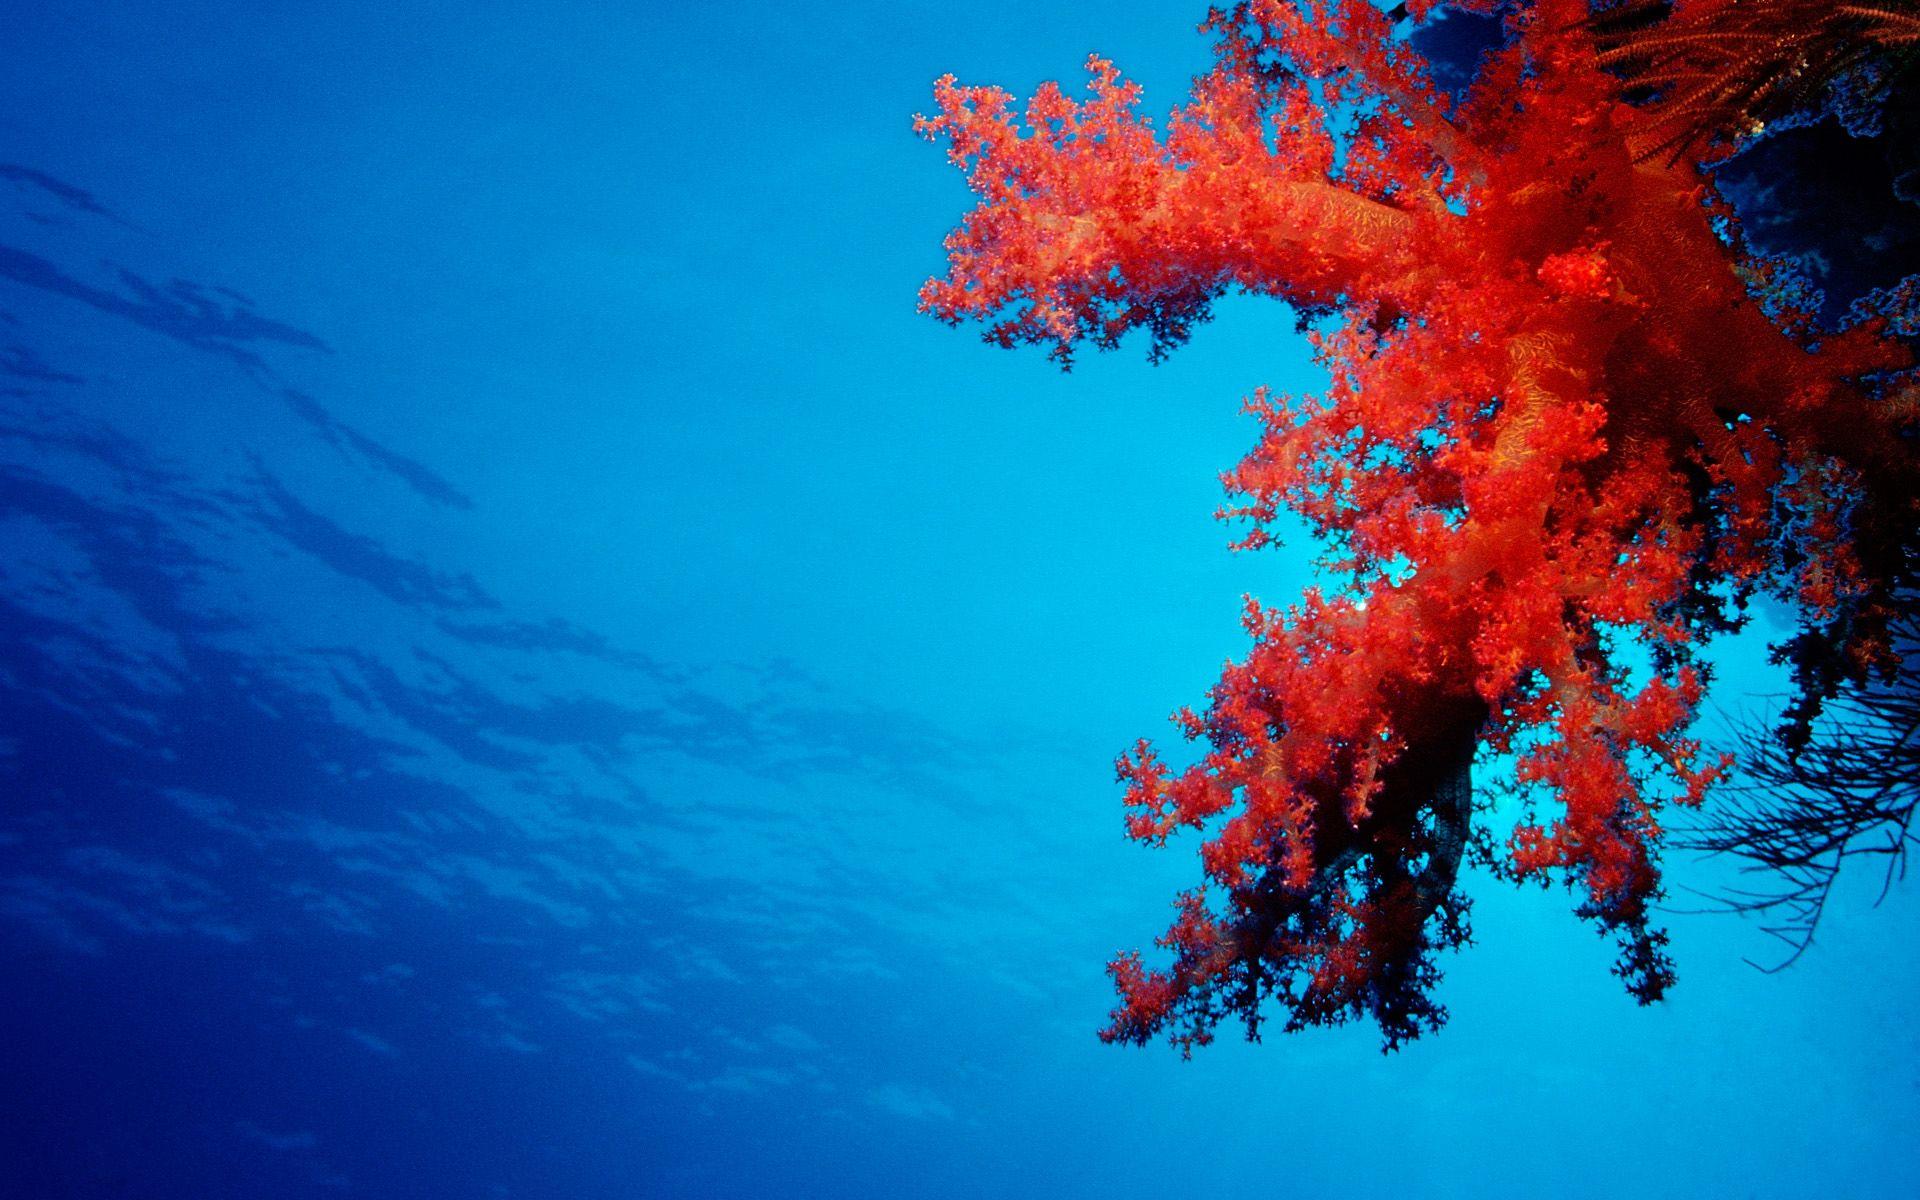 coral reef 4k ultra hd wallpaper | 8k ultra hd 4k ultra hd hd 1080